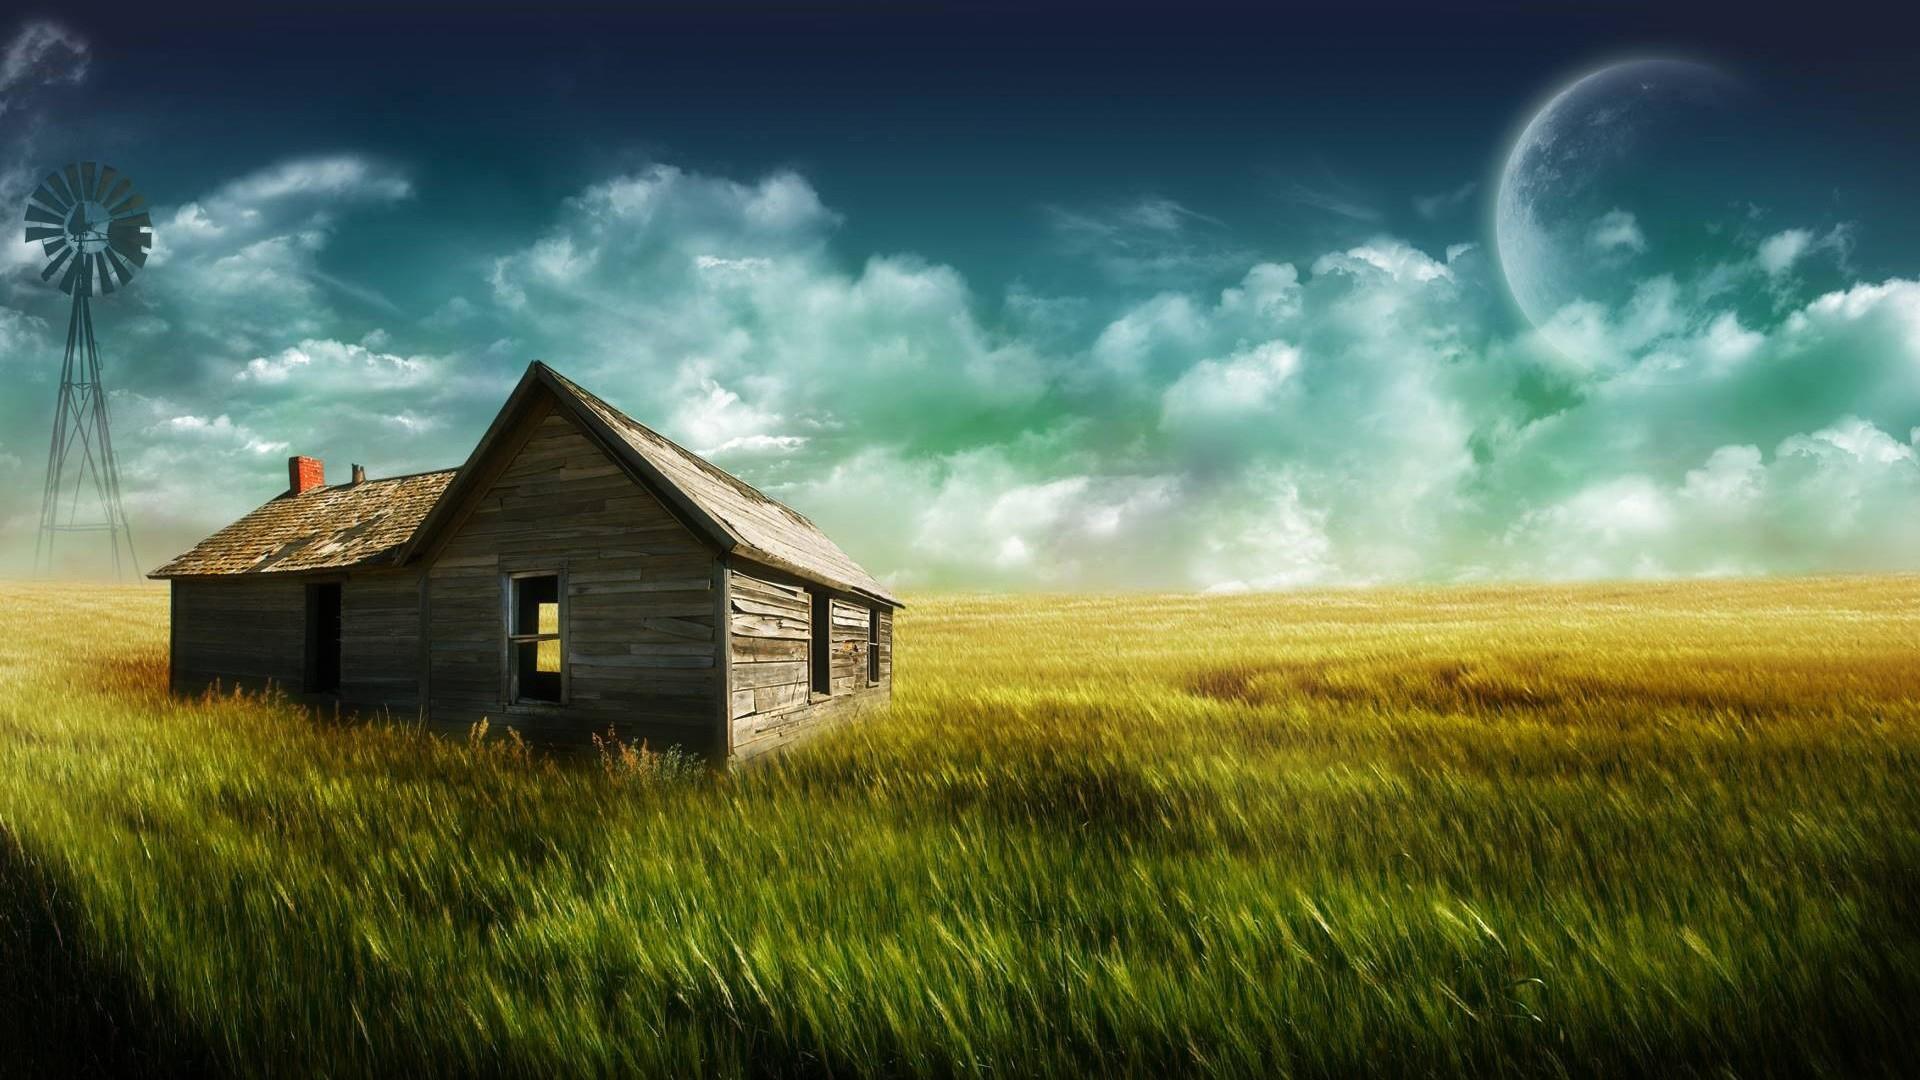 Cool-geffddf-Home-Nature-HD-Wallpa-wallpaper-wpc9203842